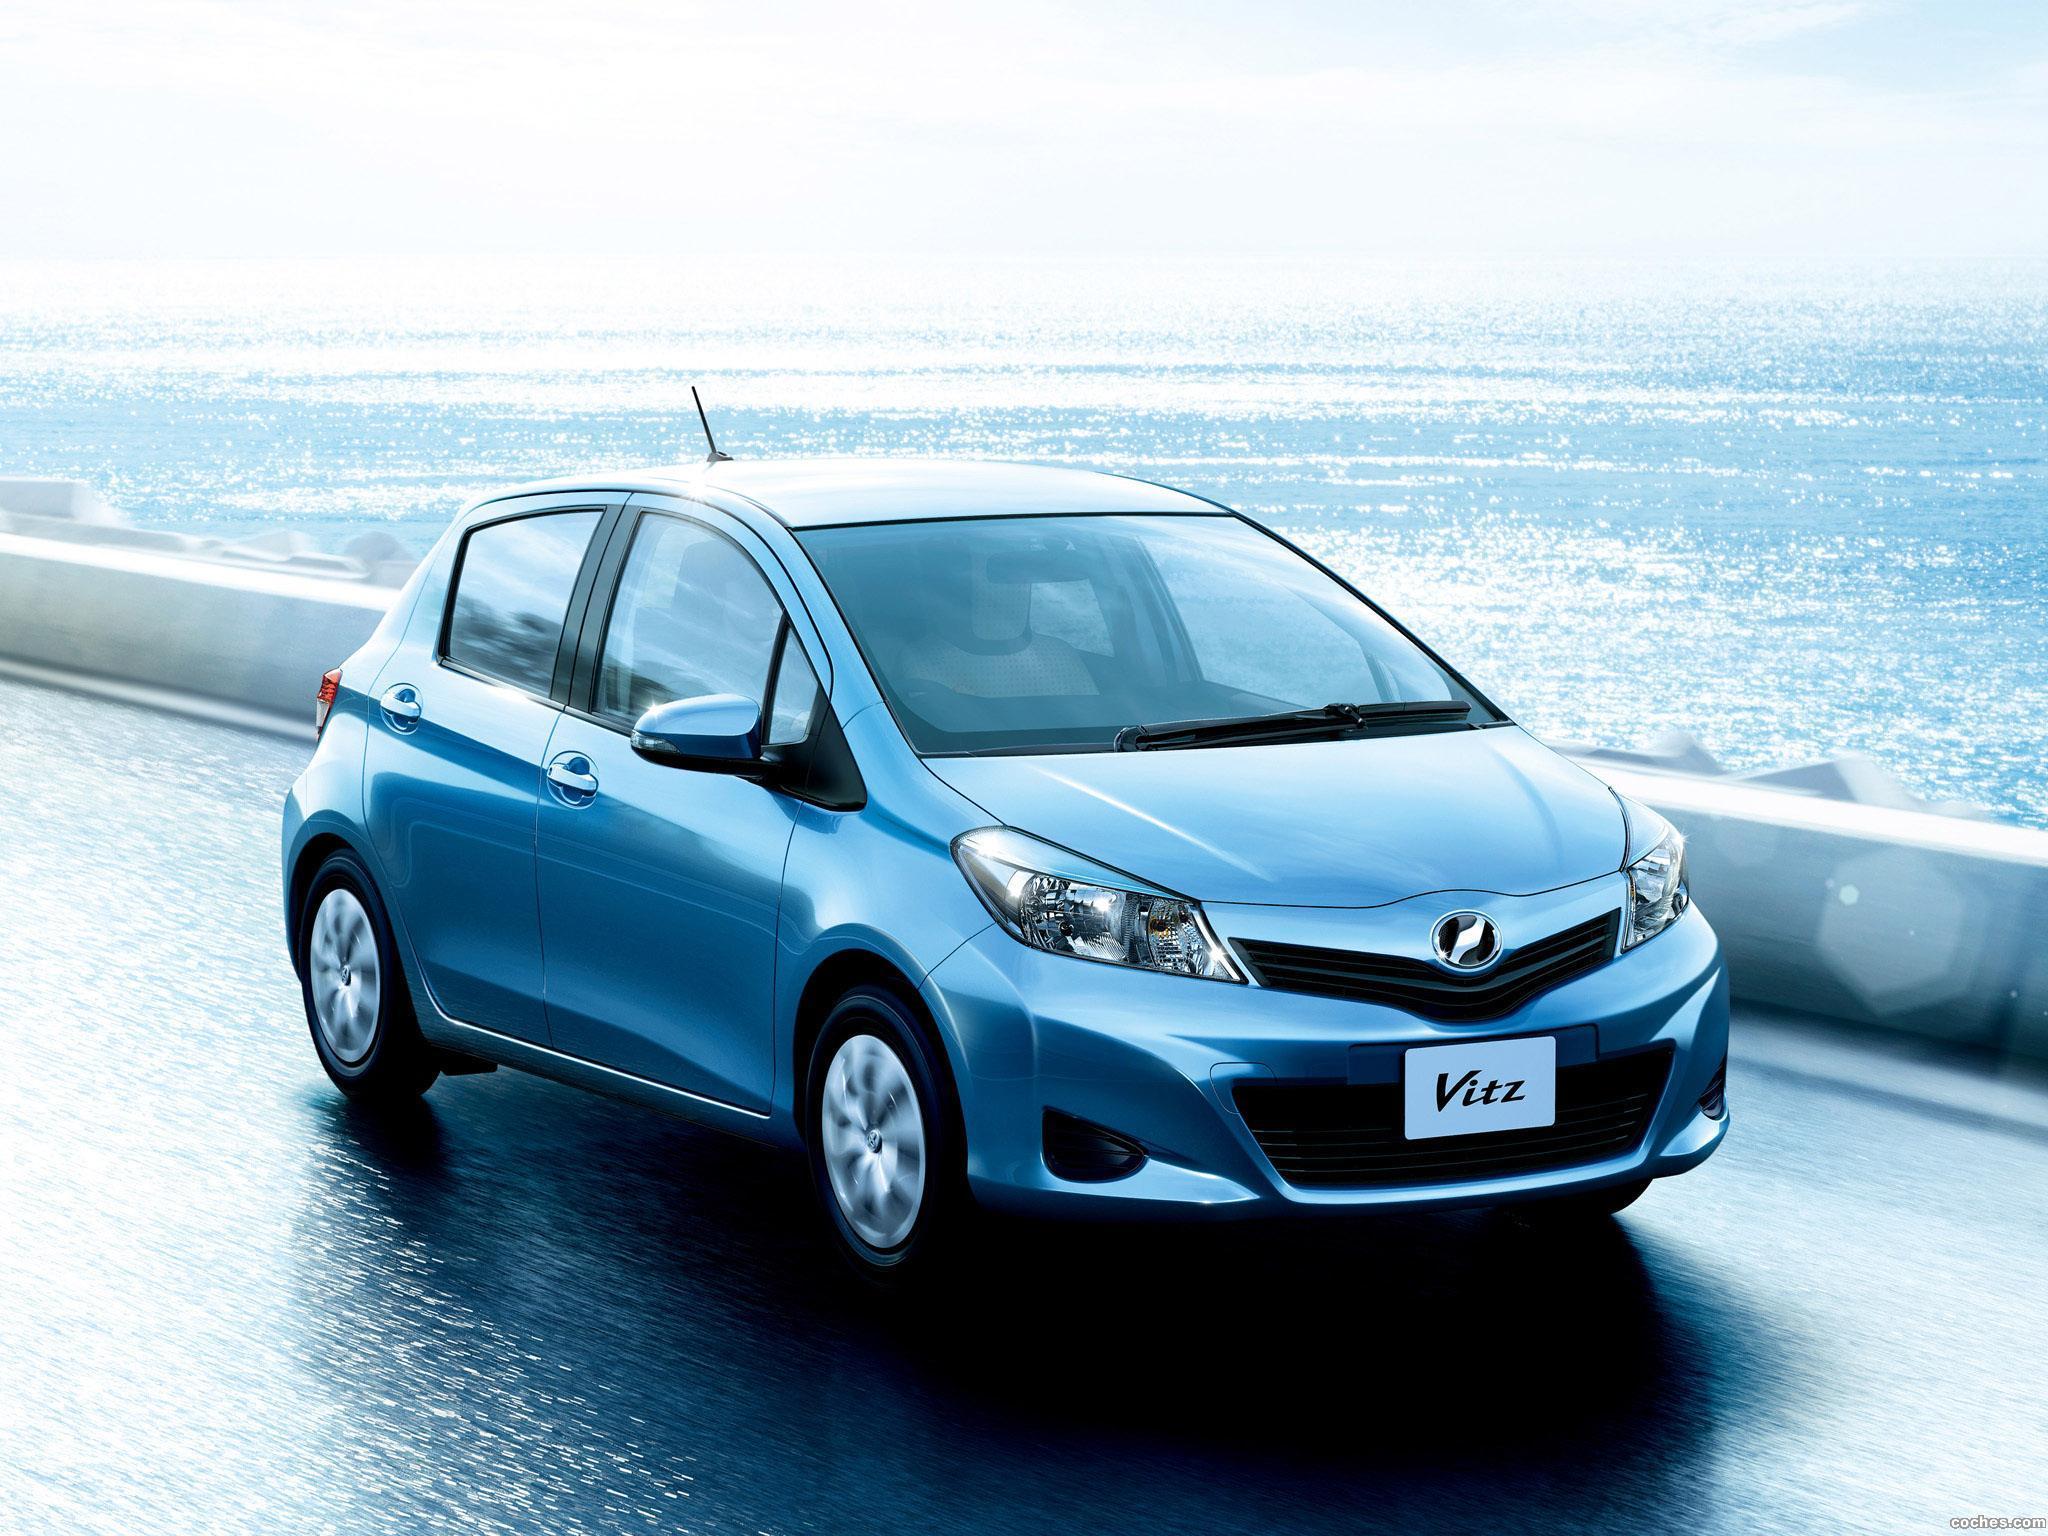 Foto 0 de Toyota Vitz 2011